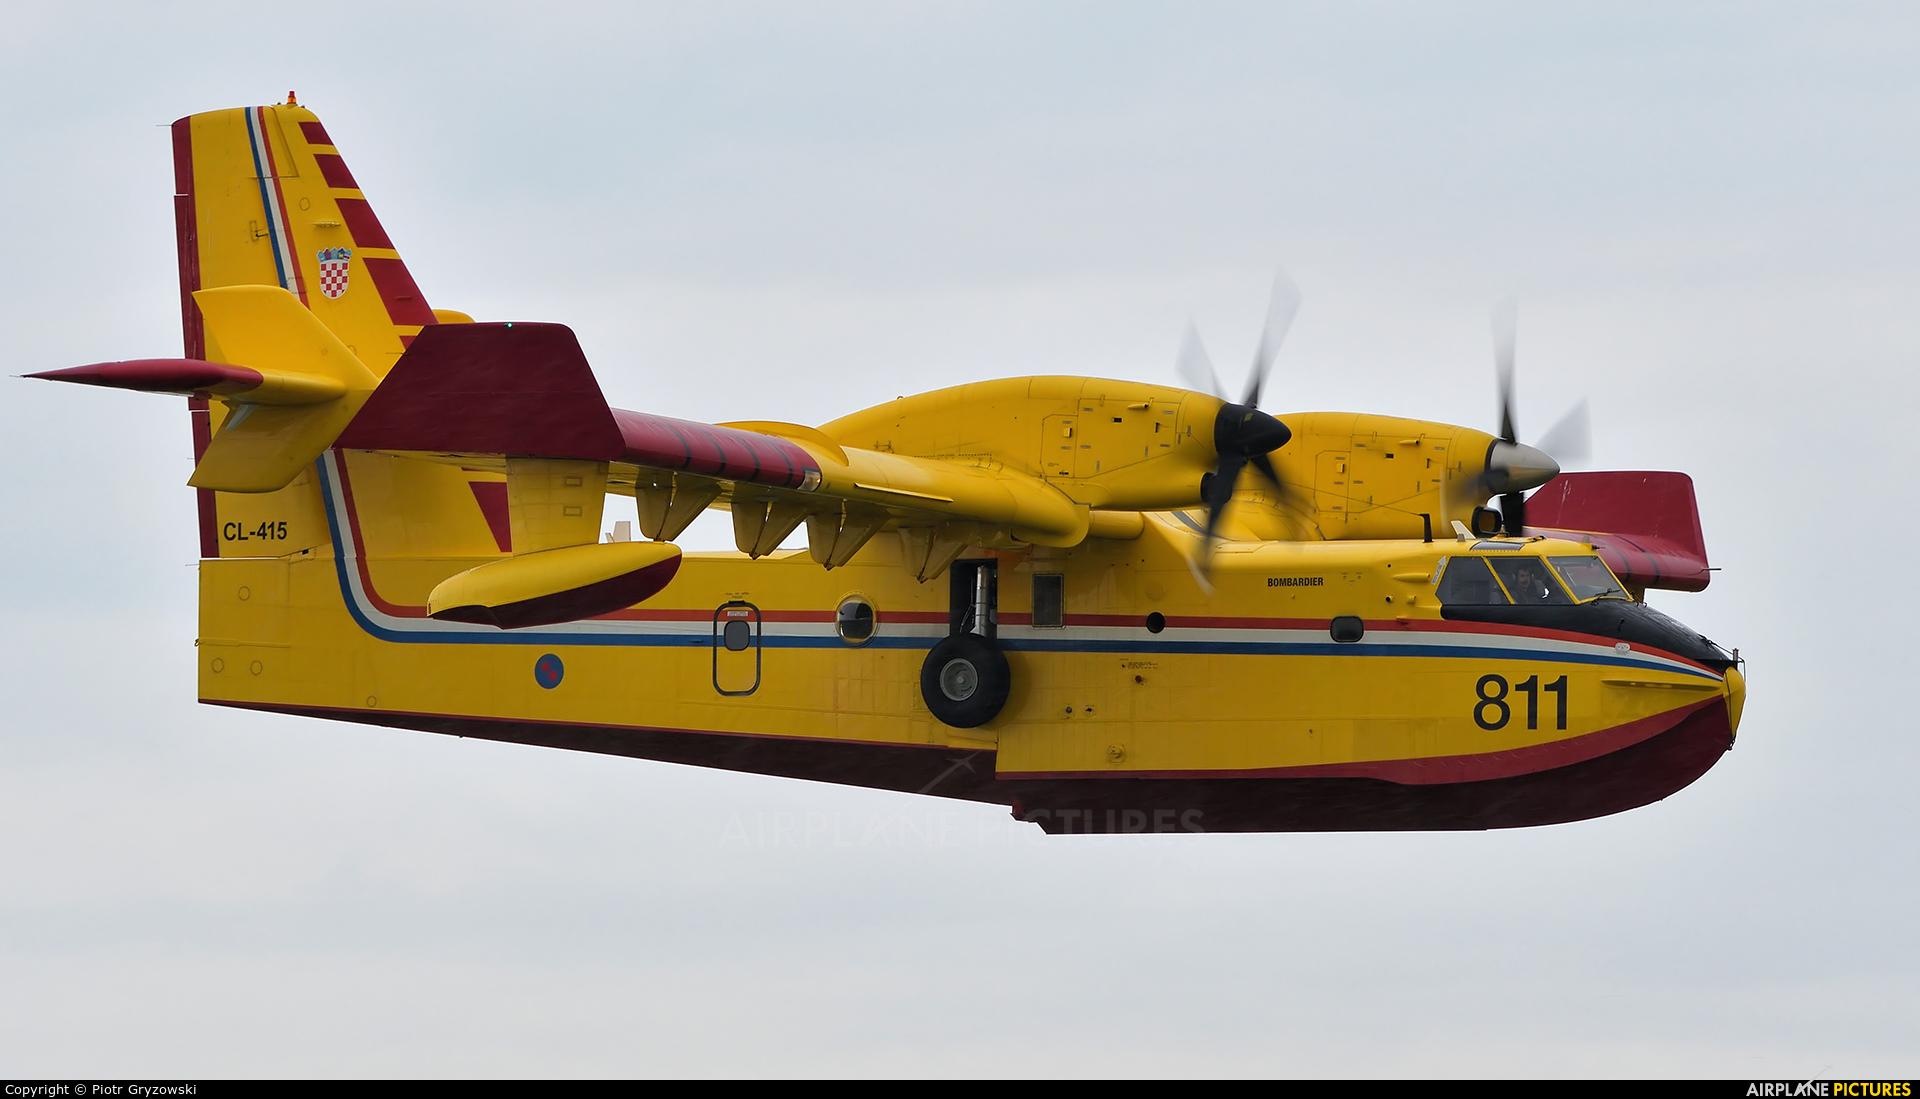 Croatia - Air Force 811 aircraft at Varazdin